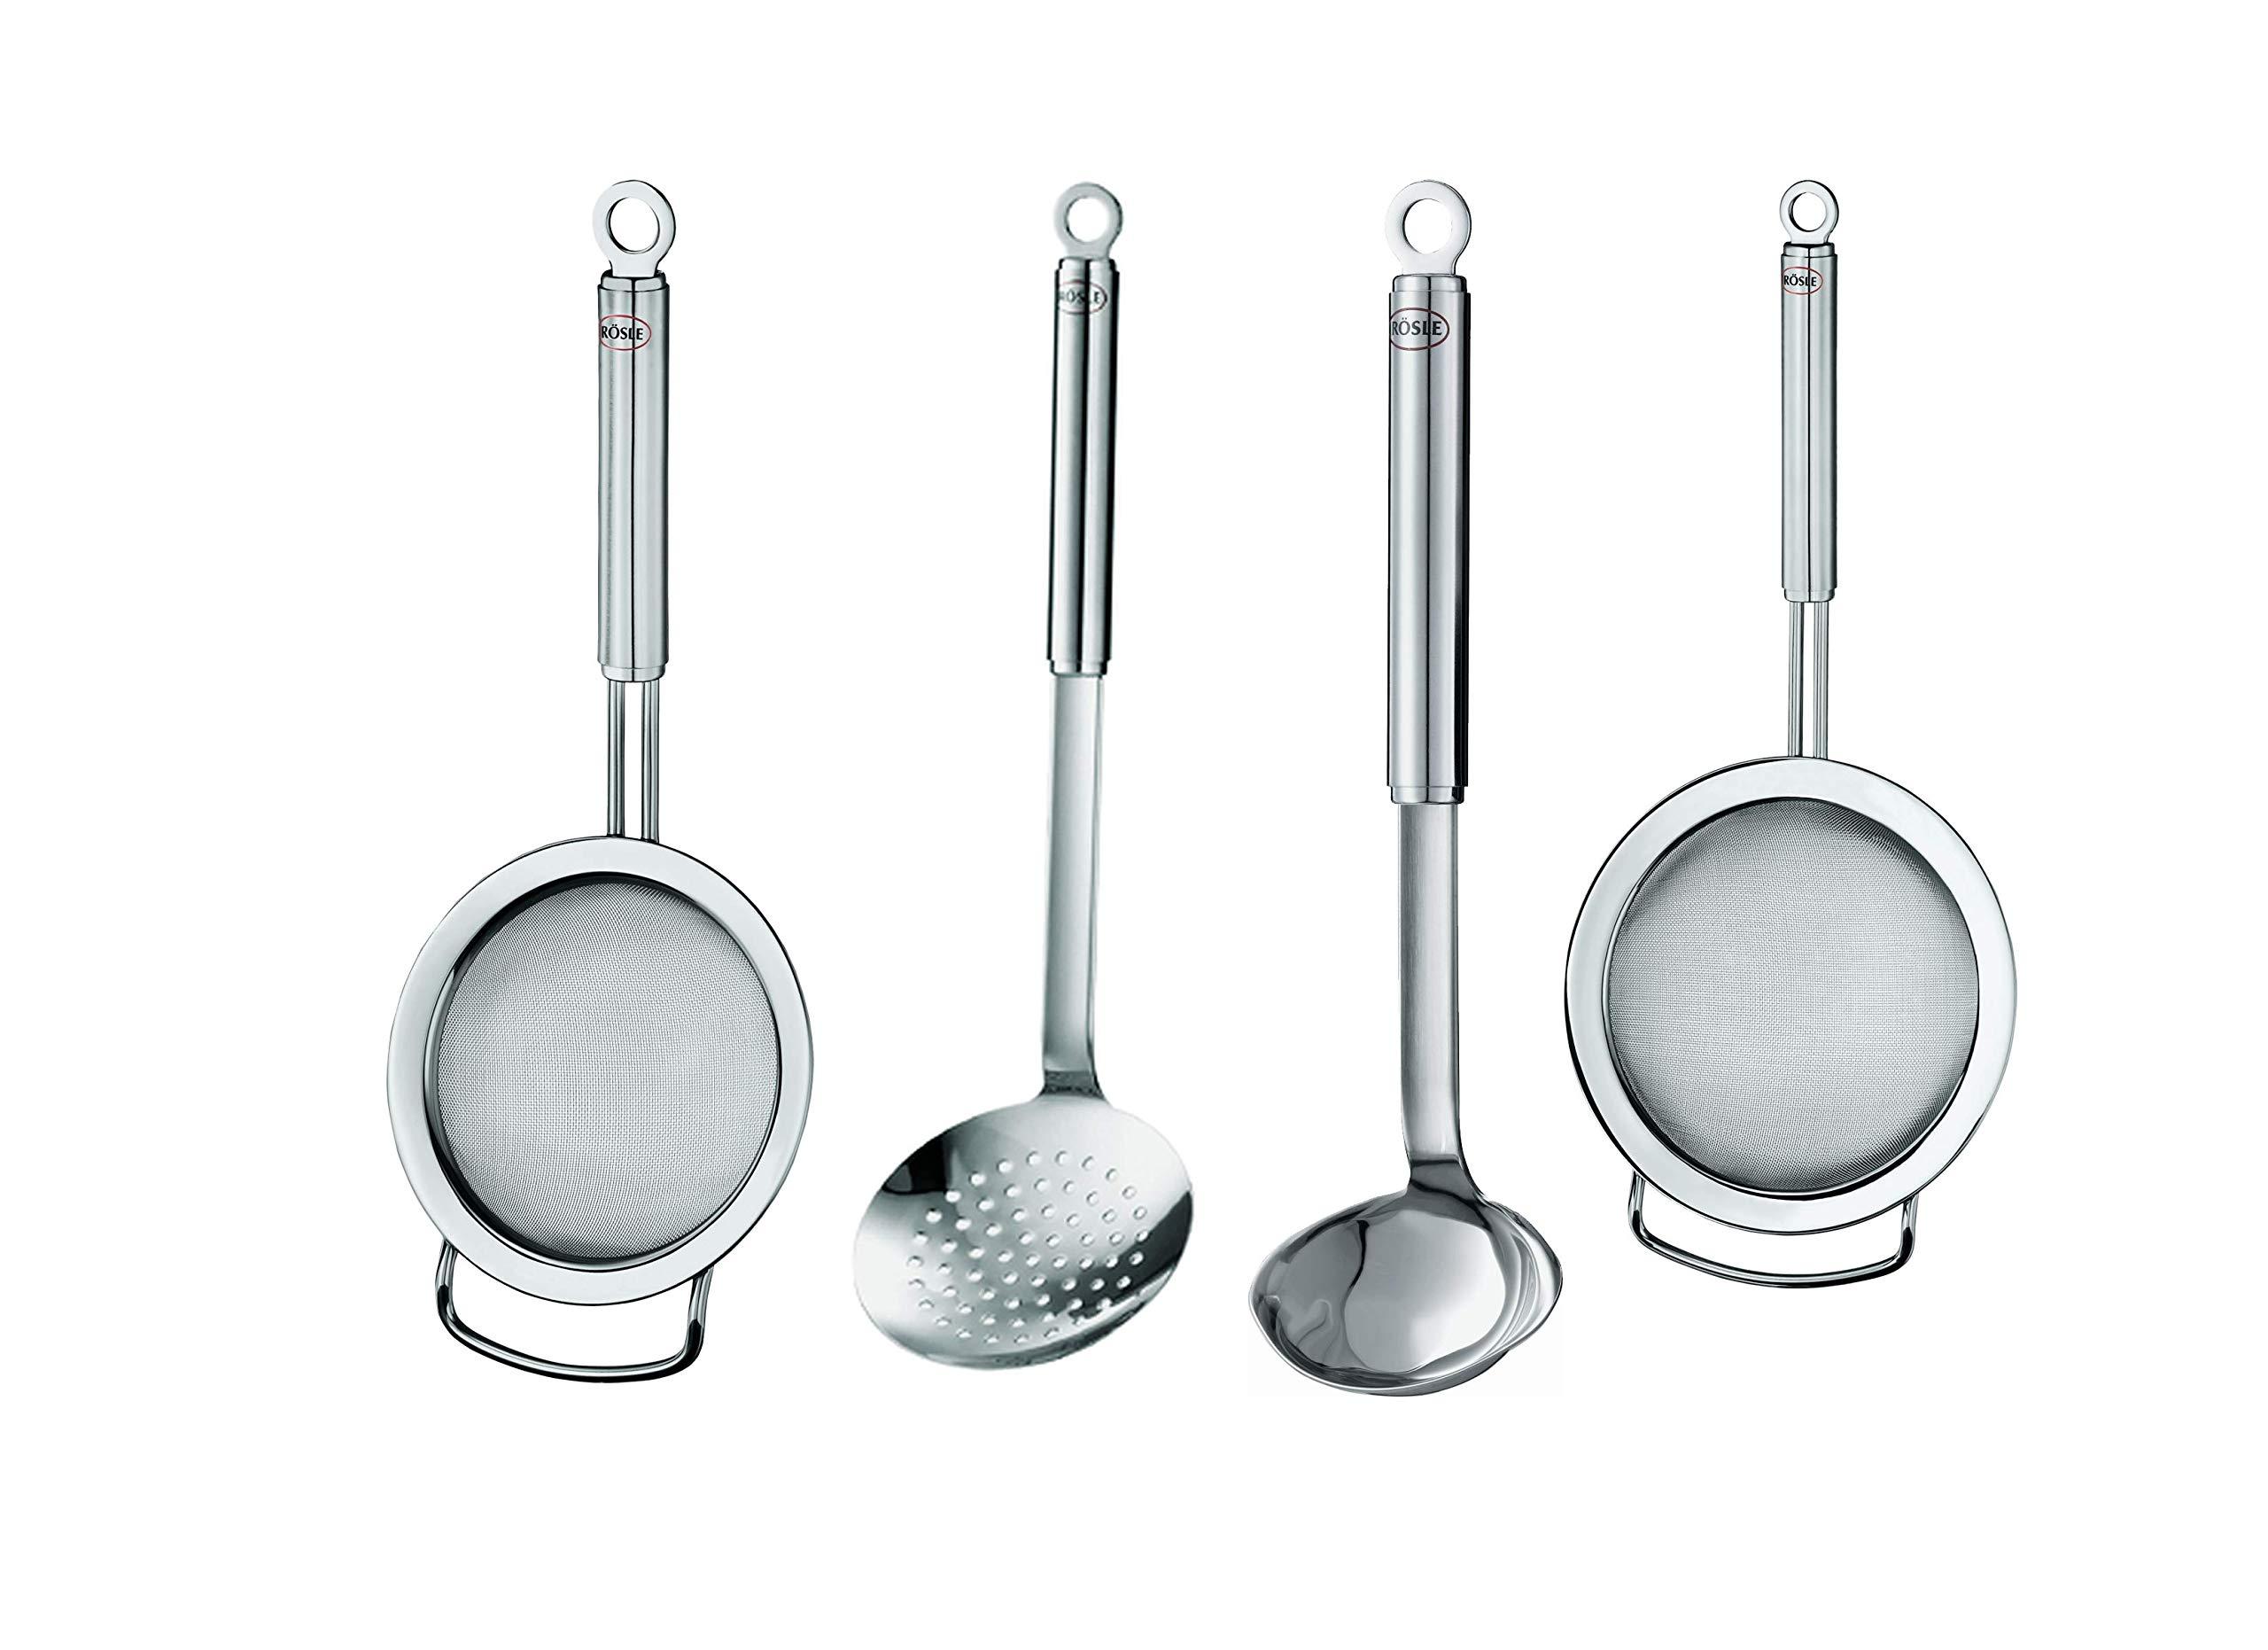 Details about Rösle Stainless Steel Kitchen Utensils Set Tea Strainer  Skimmer Sauce Ladle